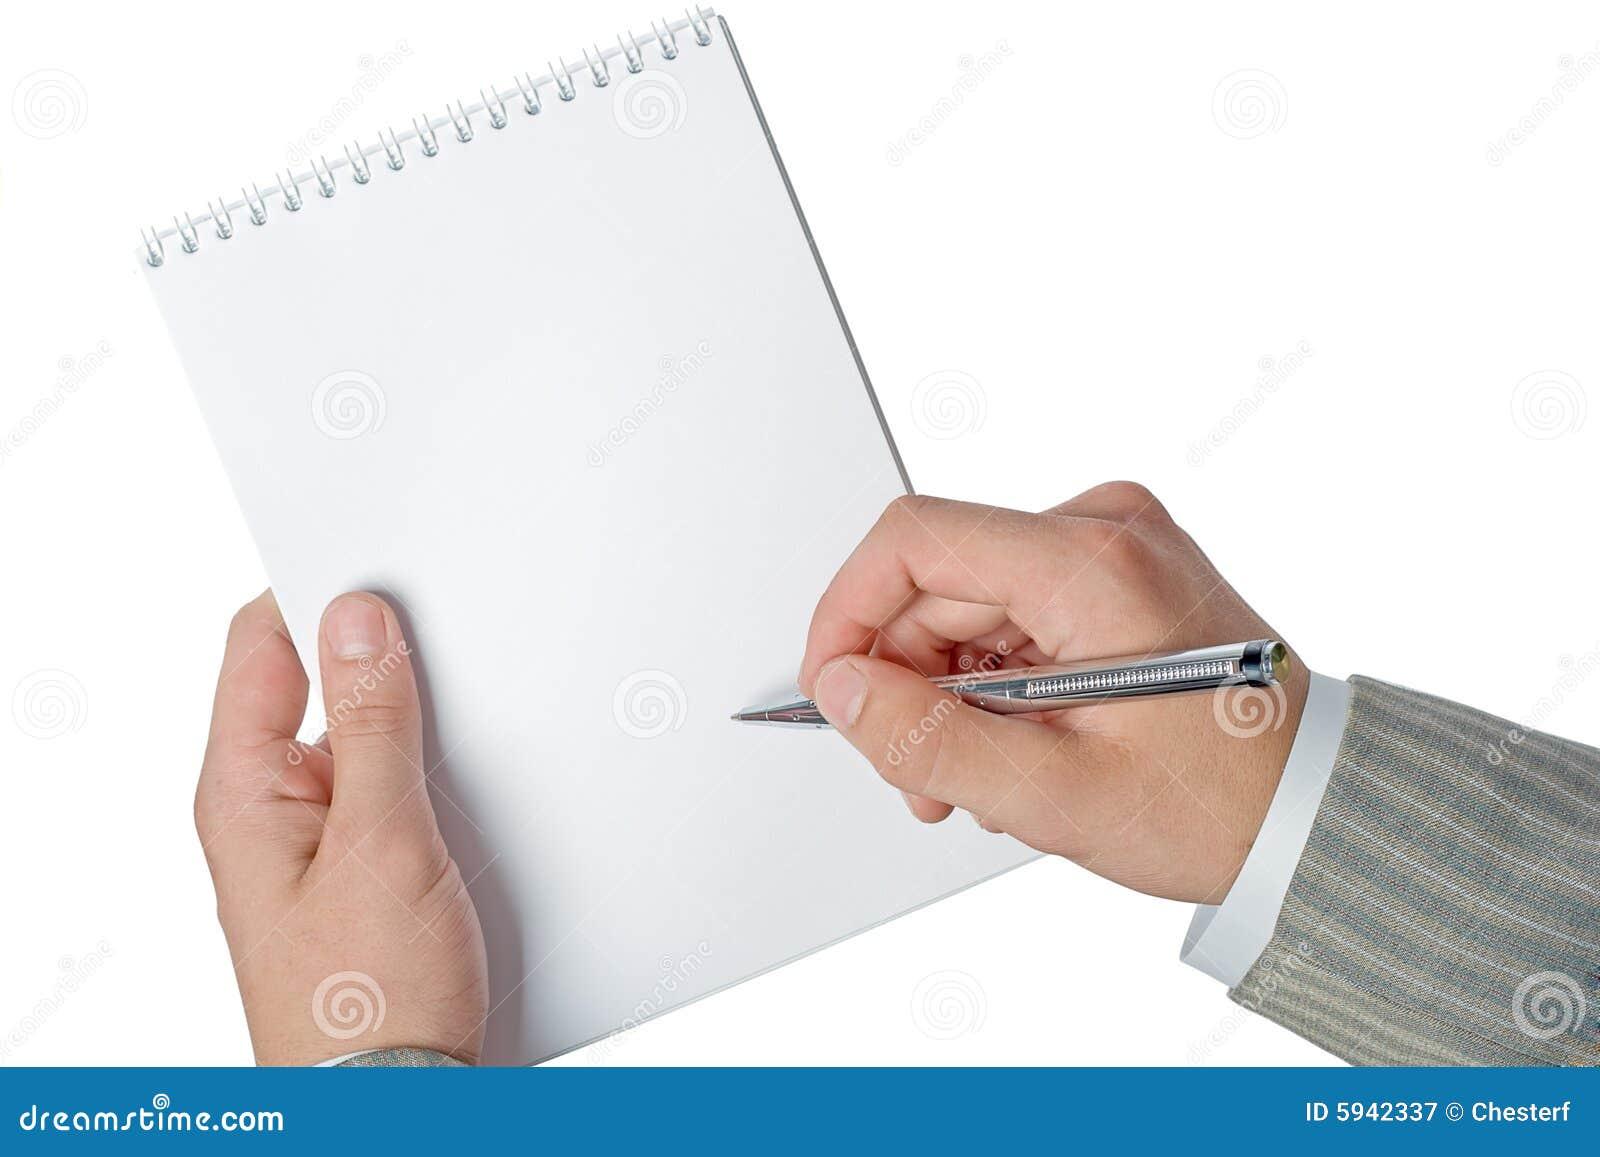 Technology Management Image: Businessman Hands Holding Notepad Stock Image